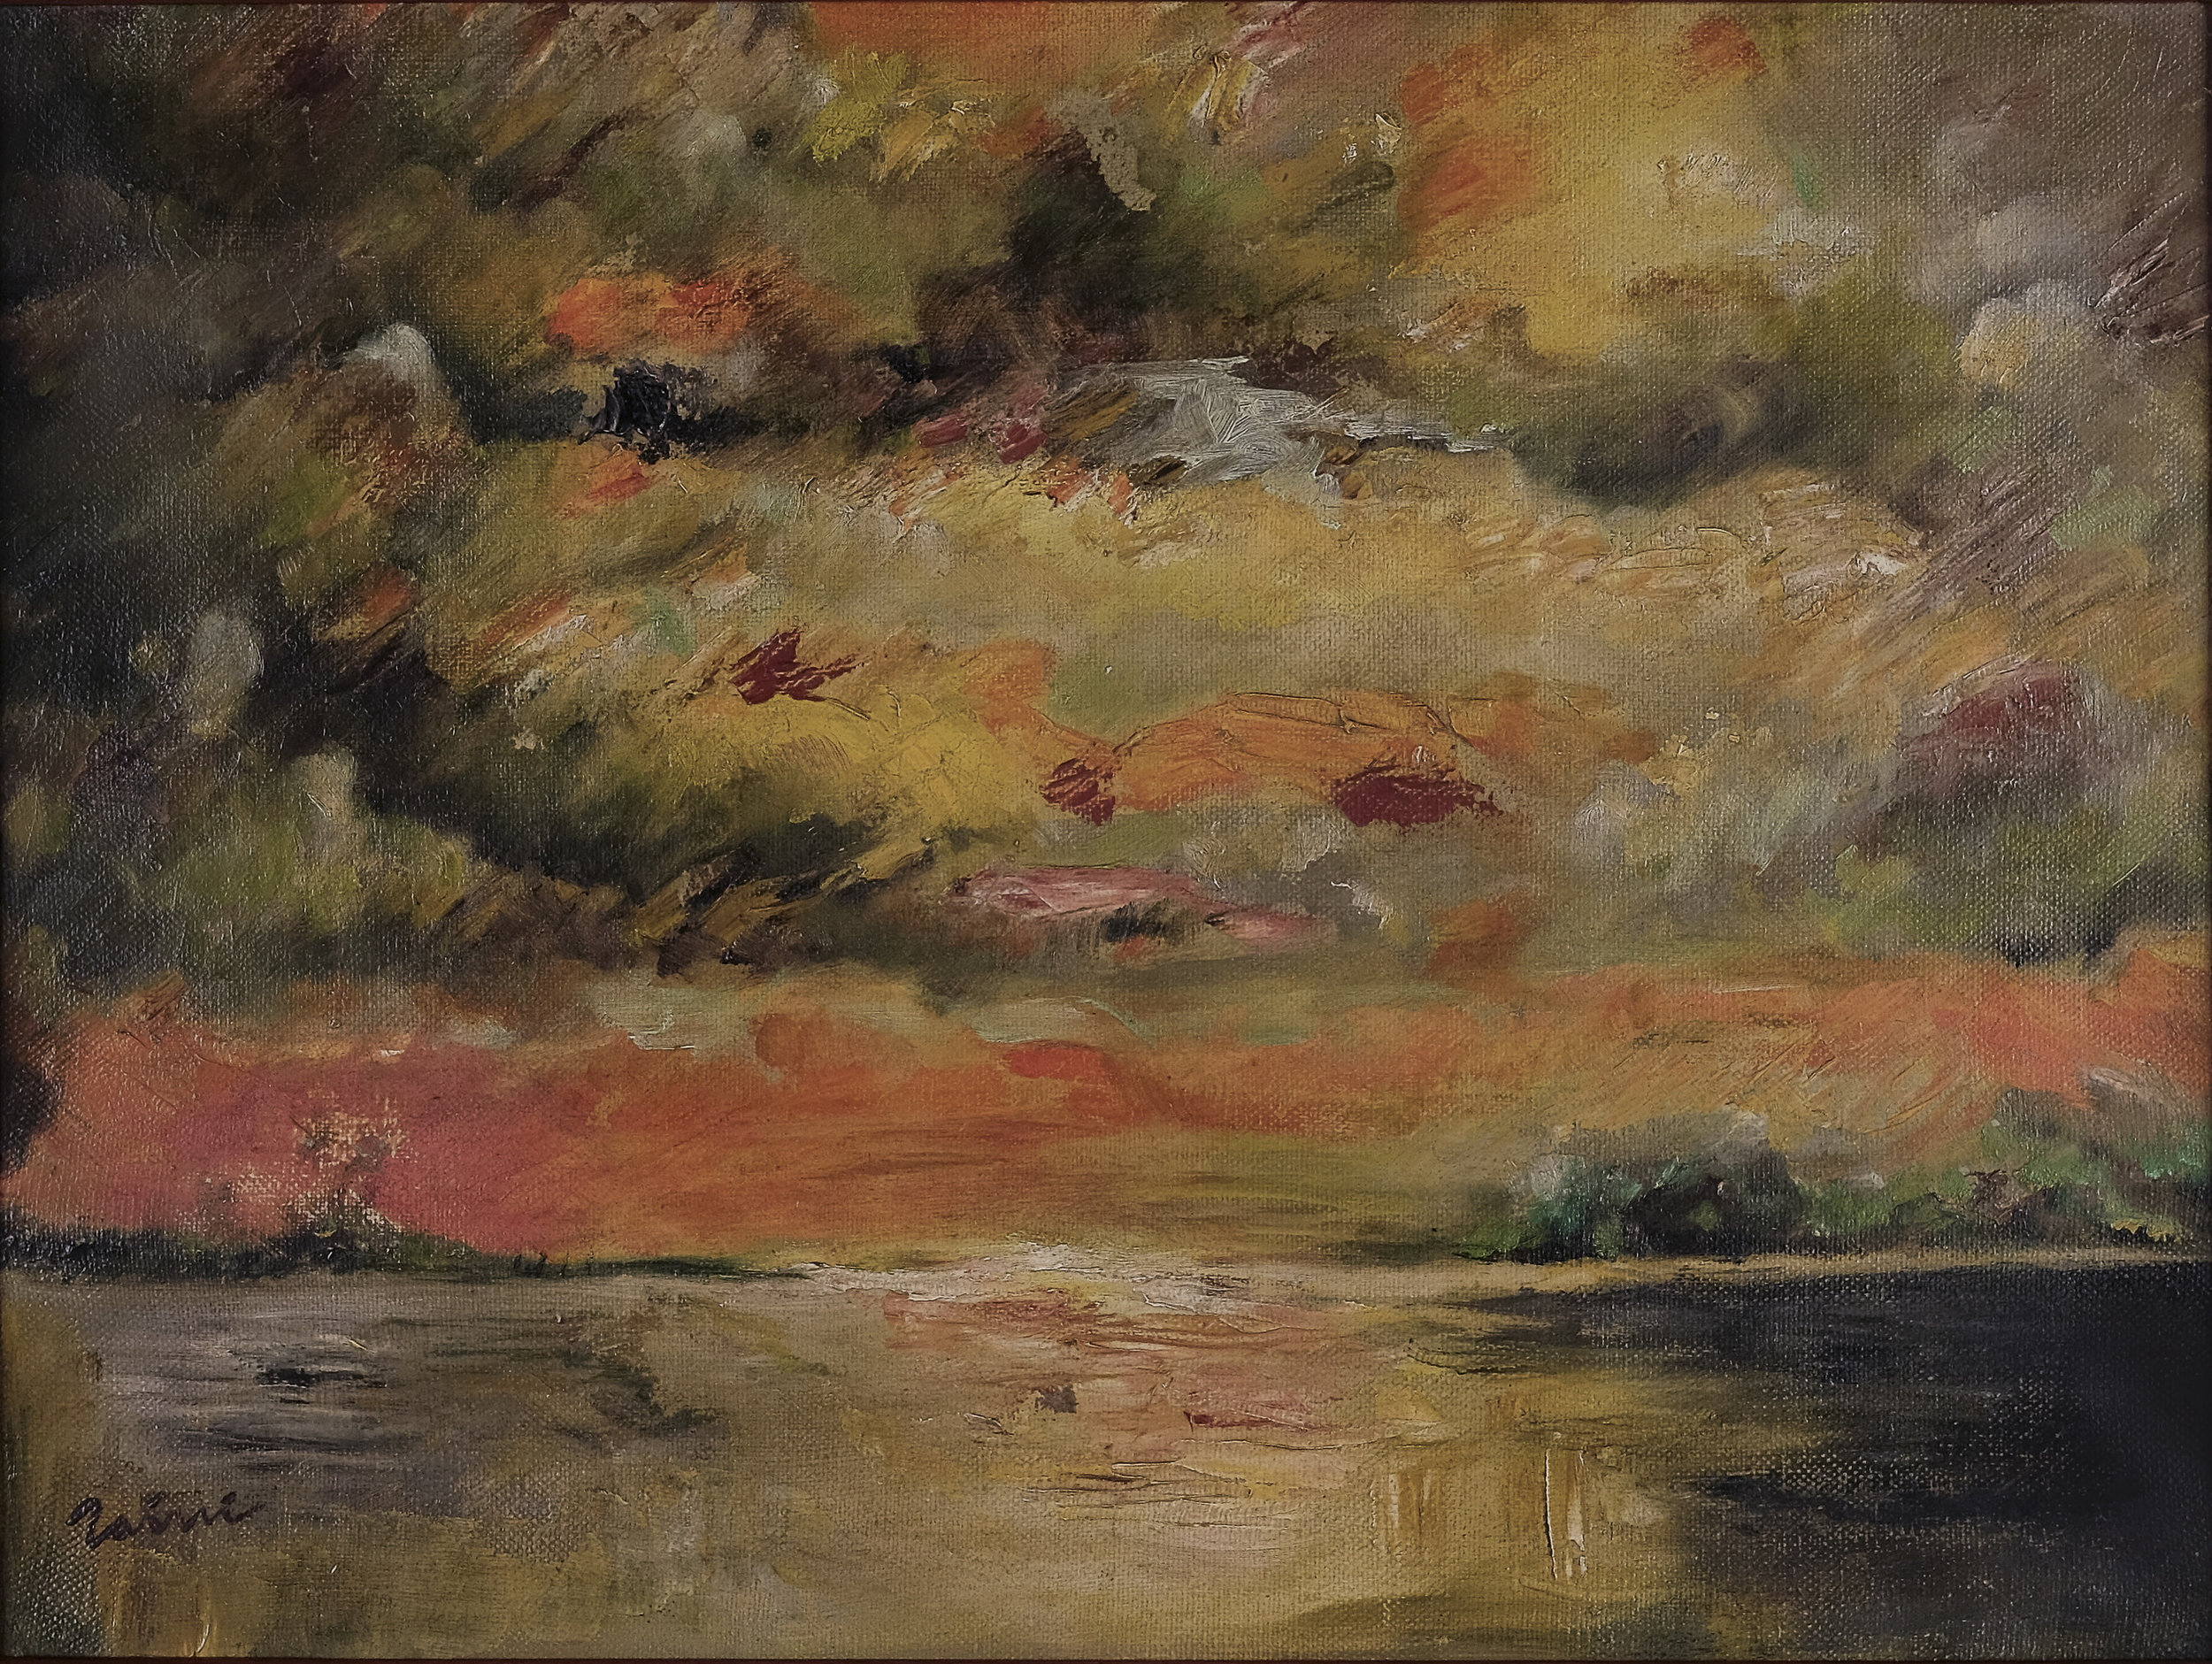 Zaini, Lembayung Senja (Crimson Dusk), ooc, 30 x 40 cm, 1970s.jpg